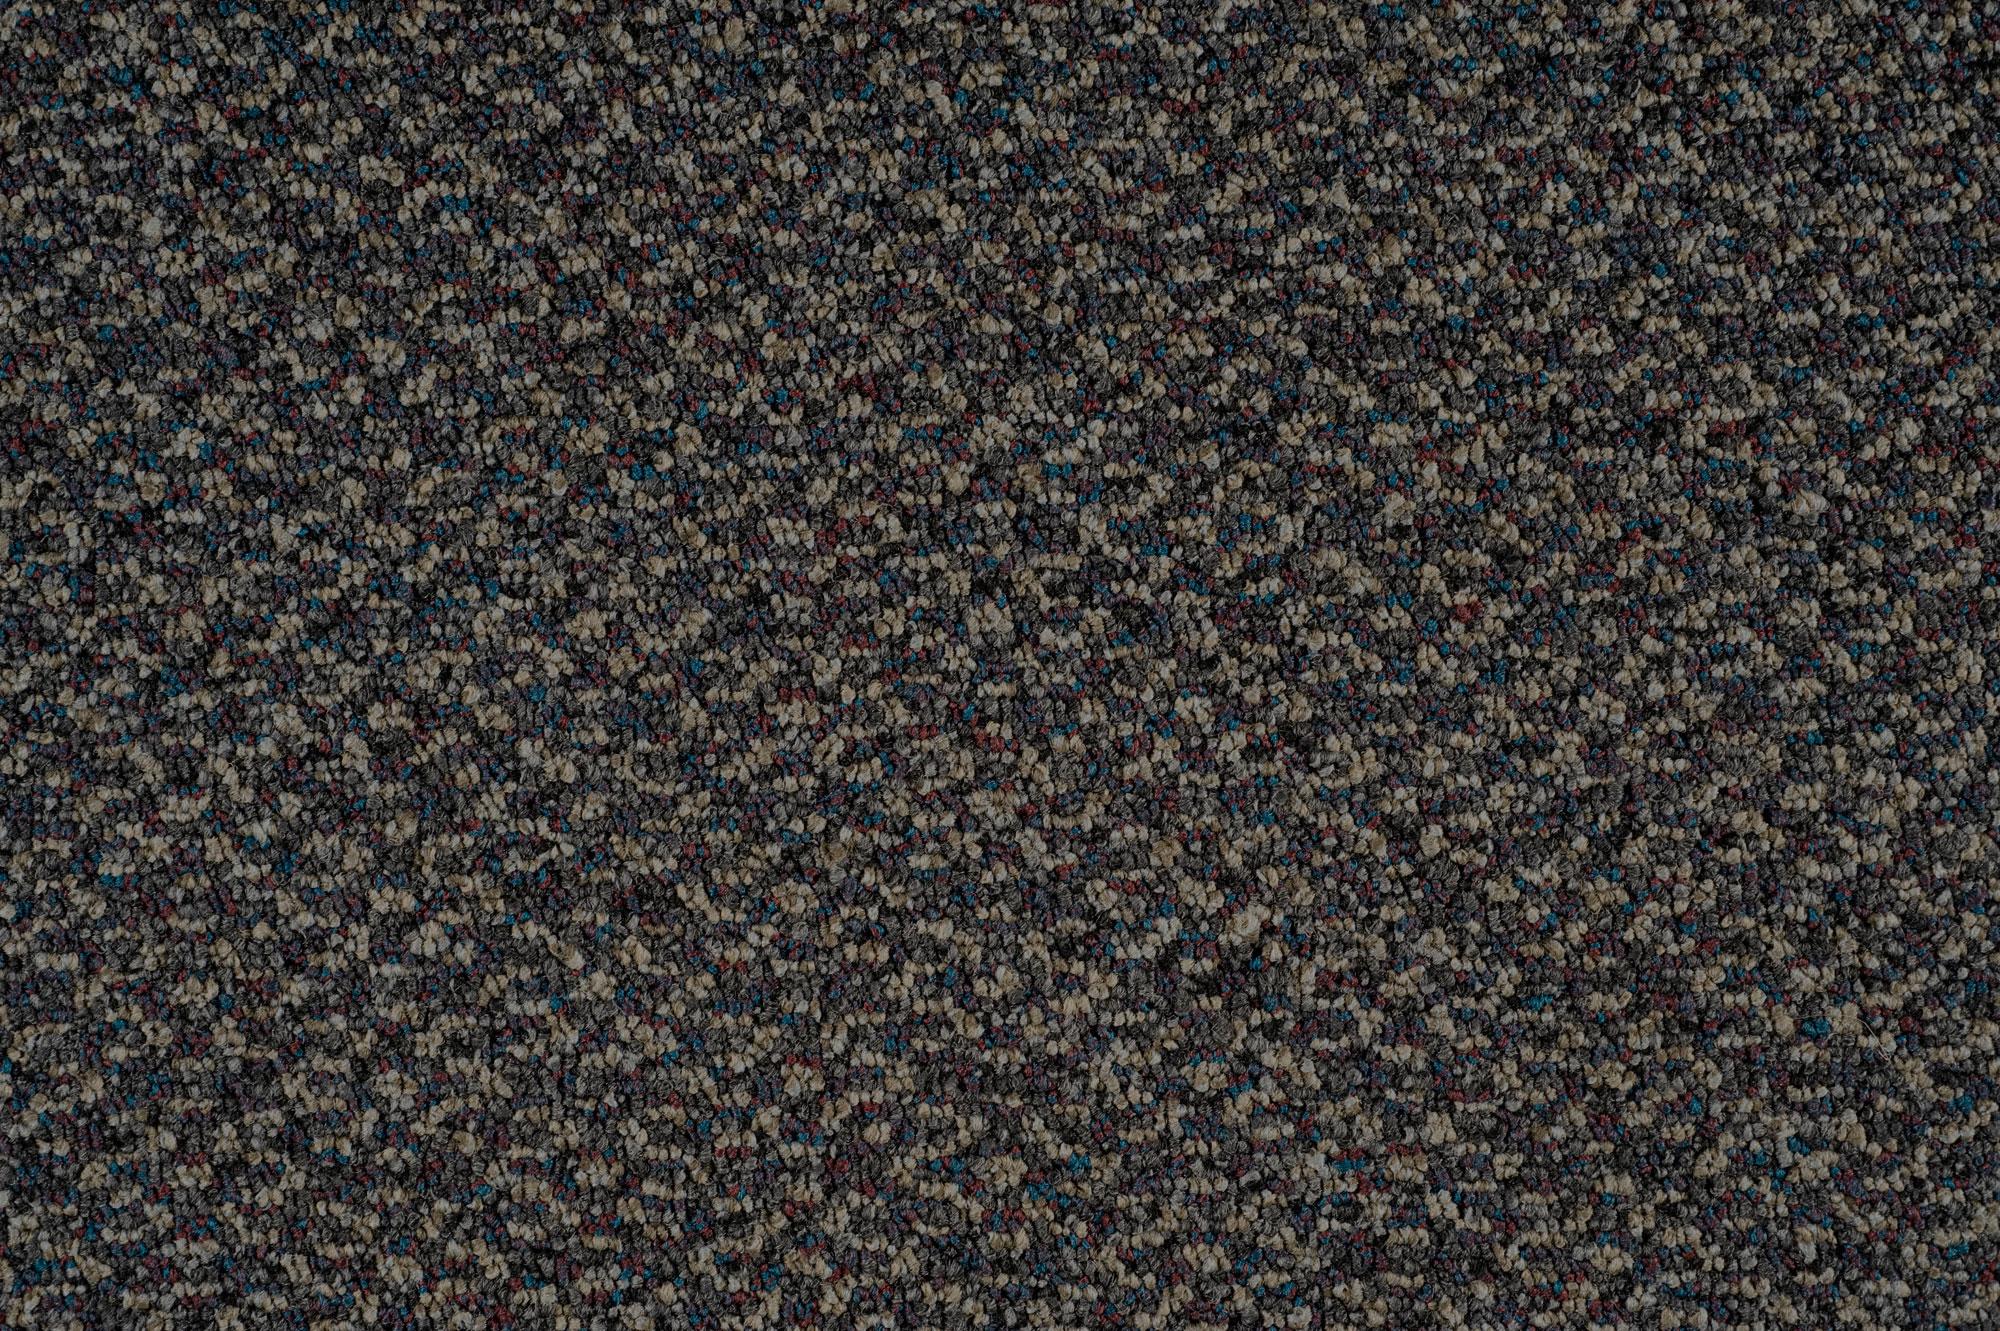 Liverpool Echo Arena Floor Plan Carpet Textures High Resolution Carpet Vidalondon